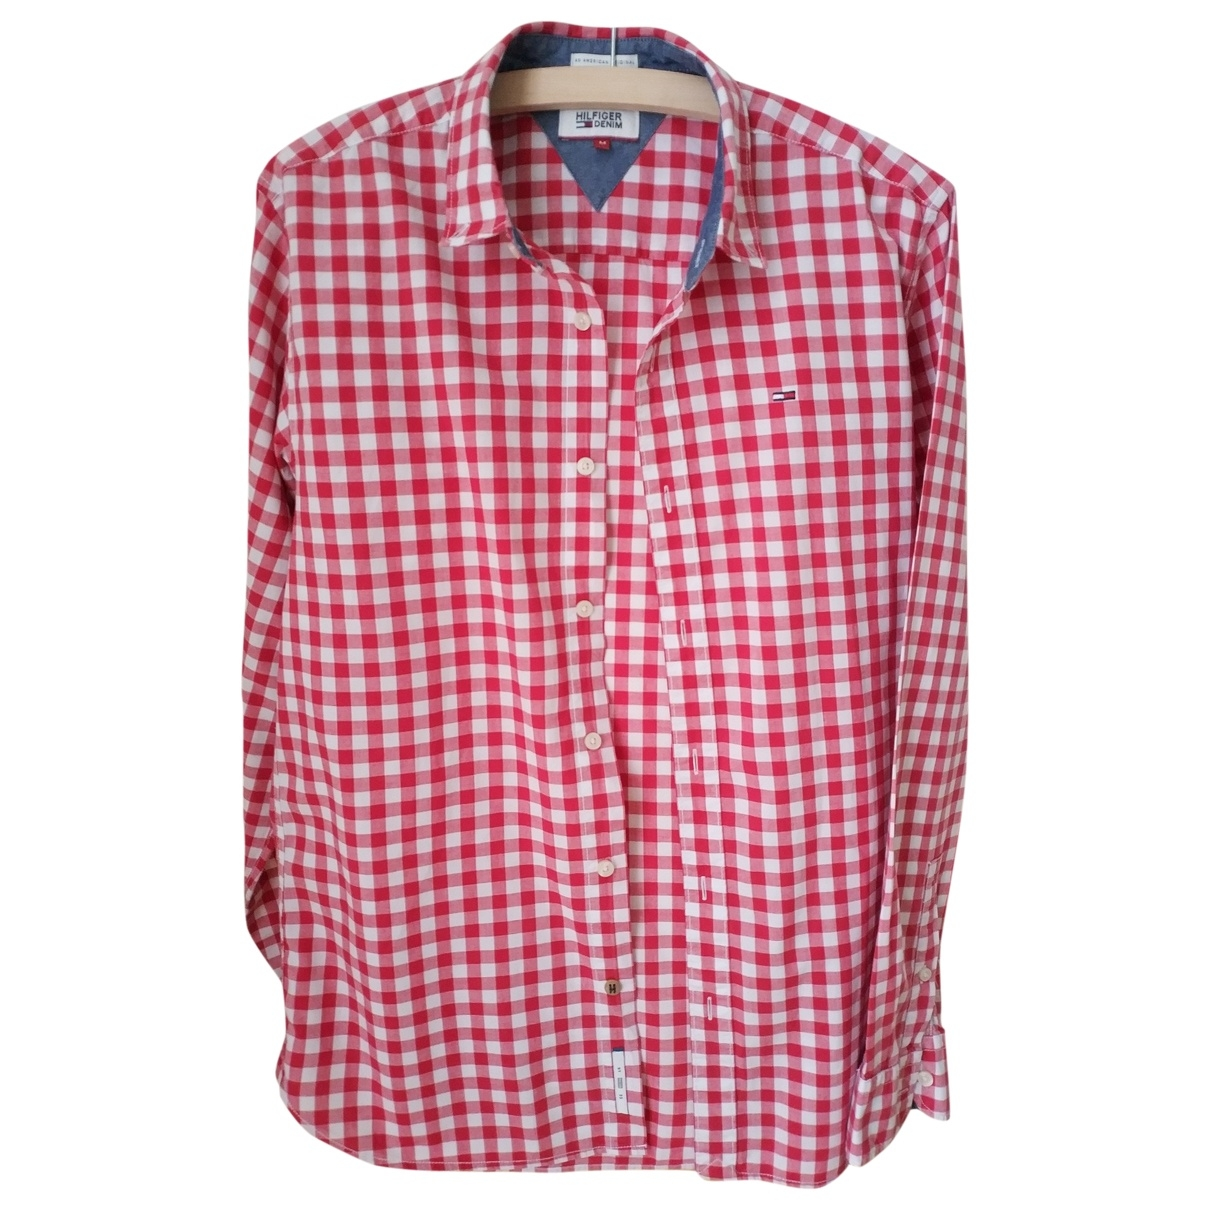 Tommy Hilfiger \N Multicolour Cotton Shirts for Men M International